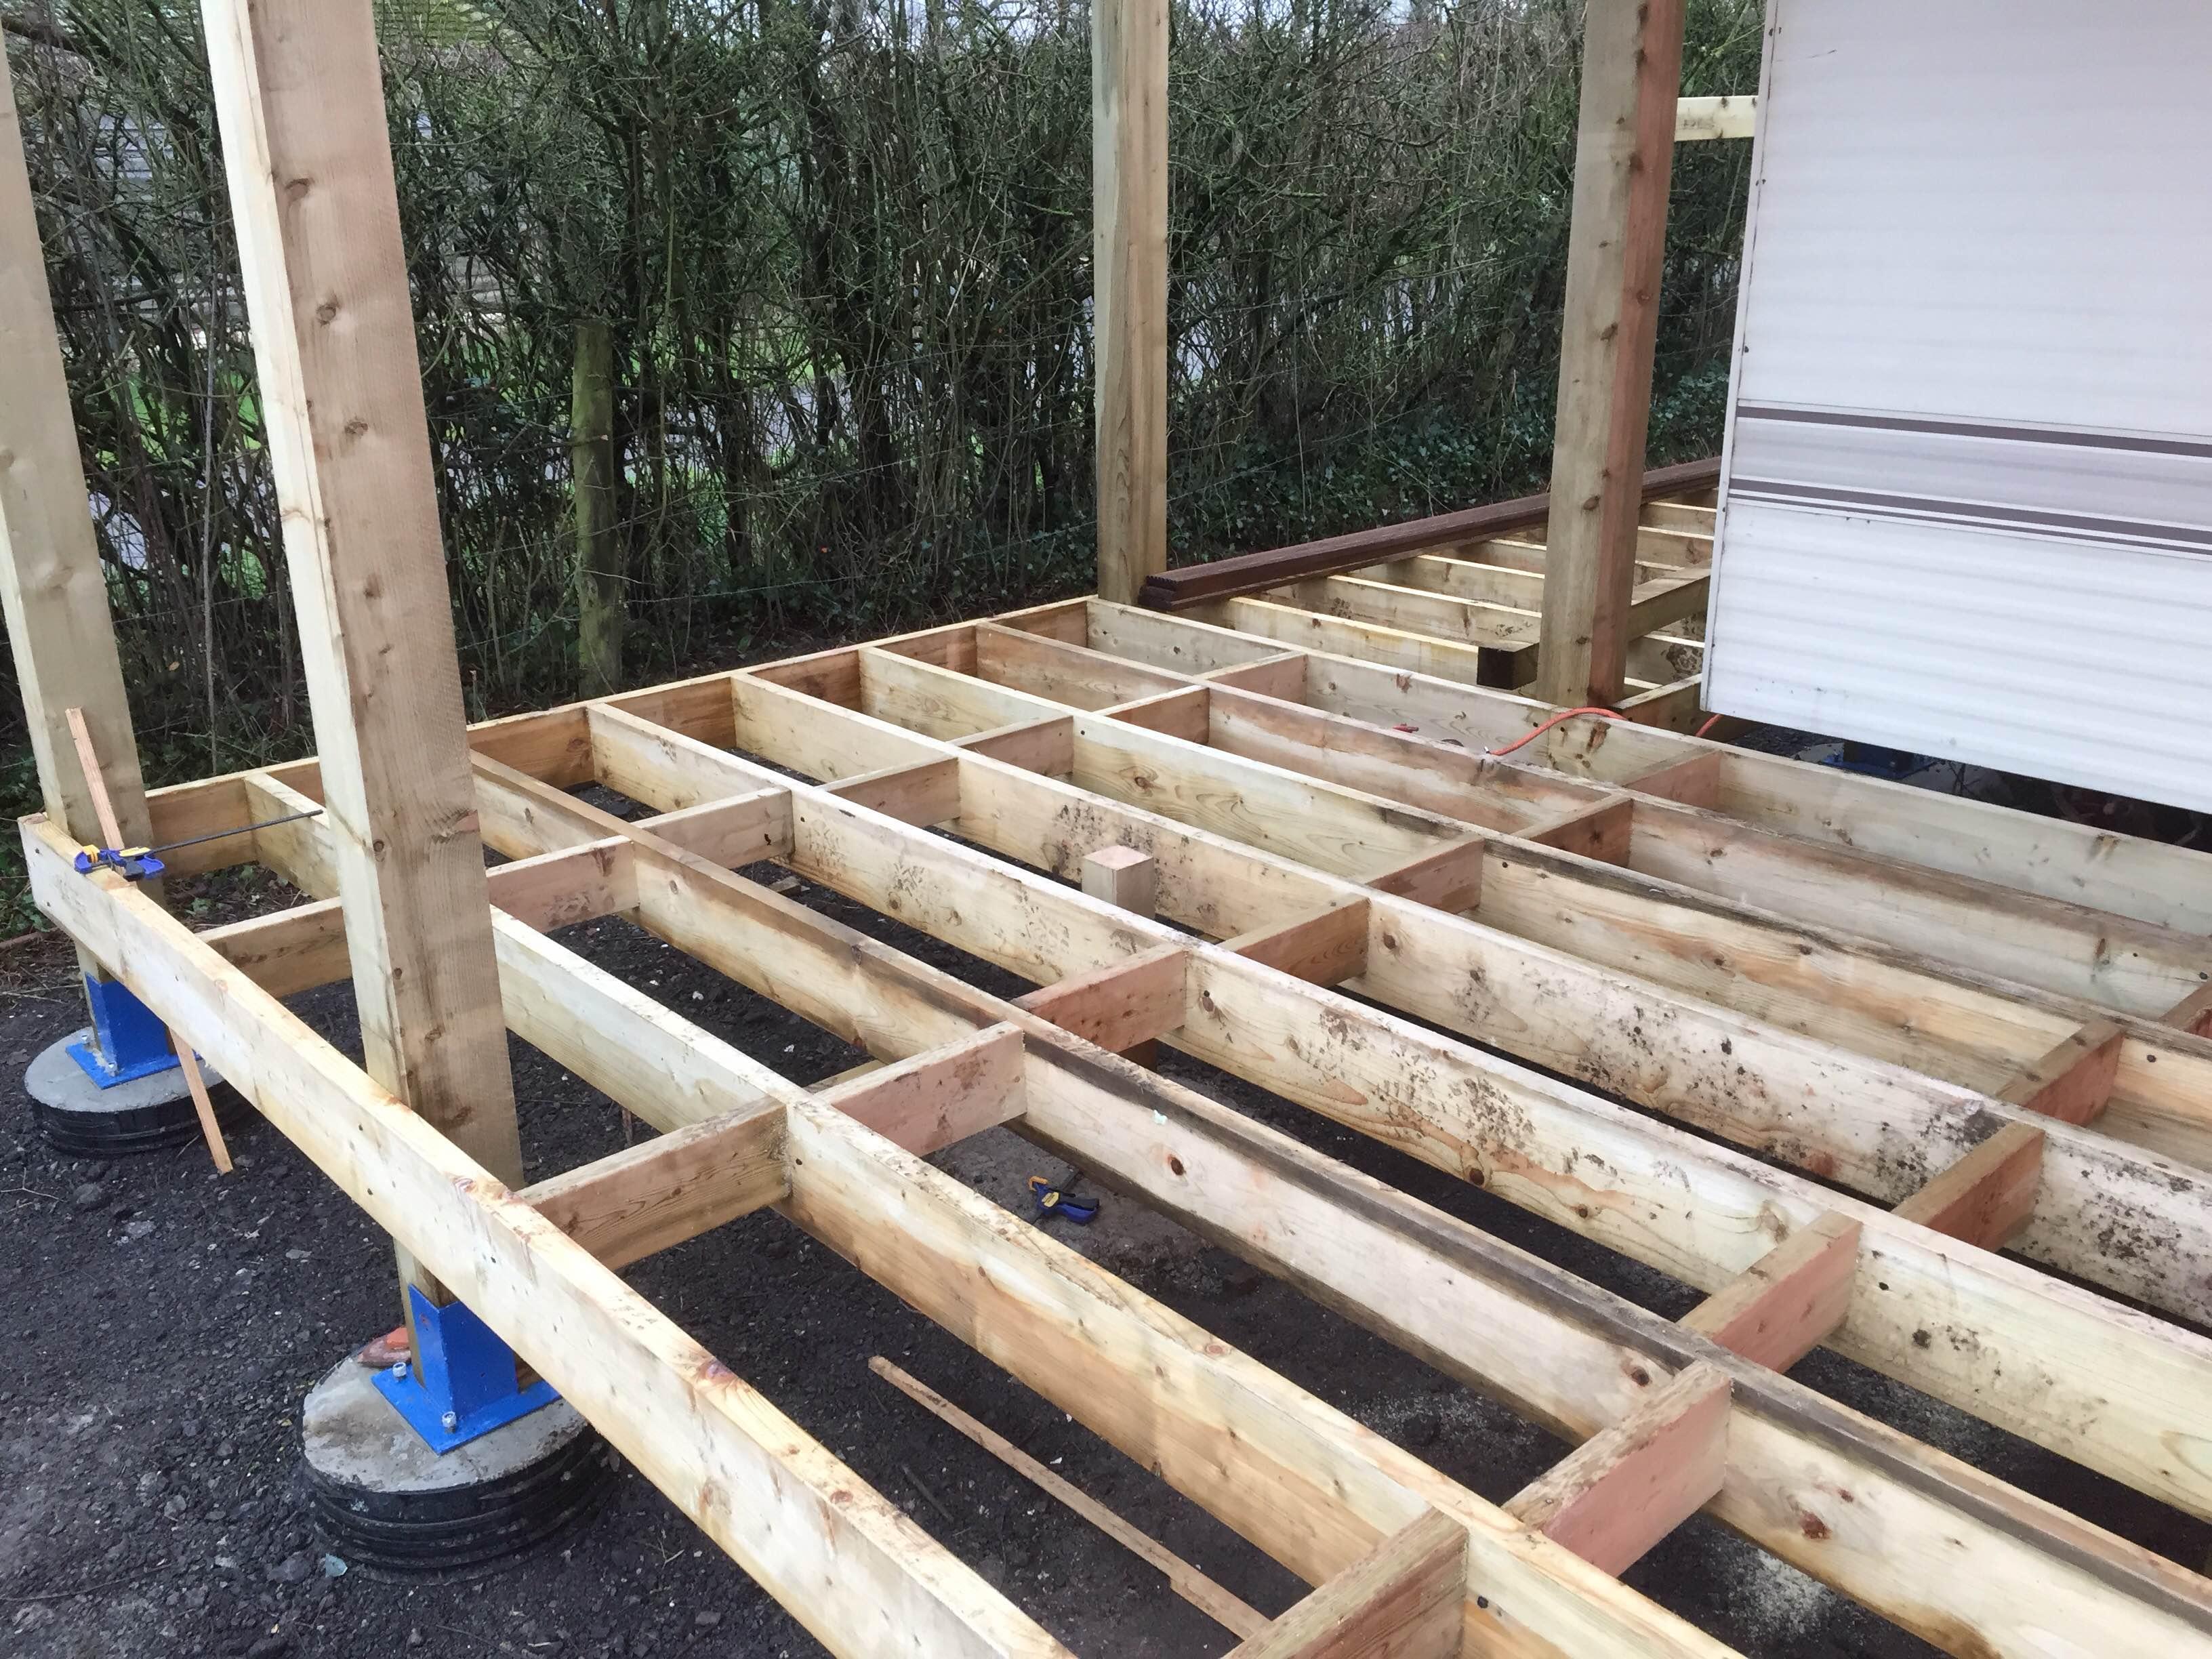 Timber Framing, Roofing & Decking – J G JONES GROUNDWORK SERVICES